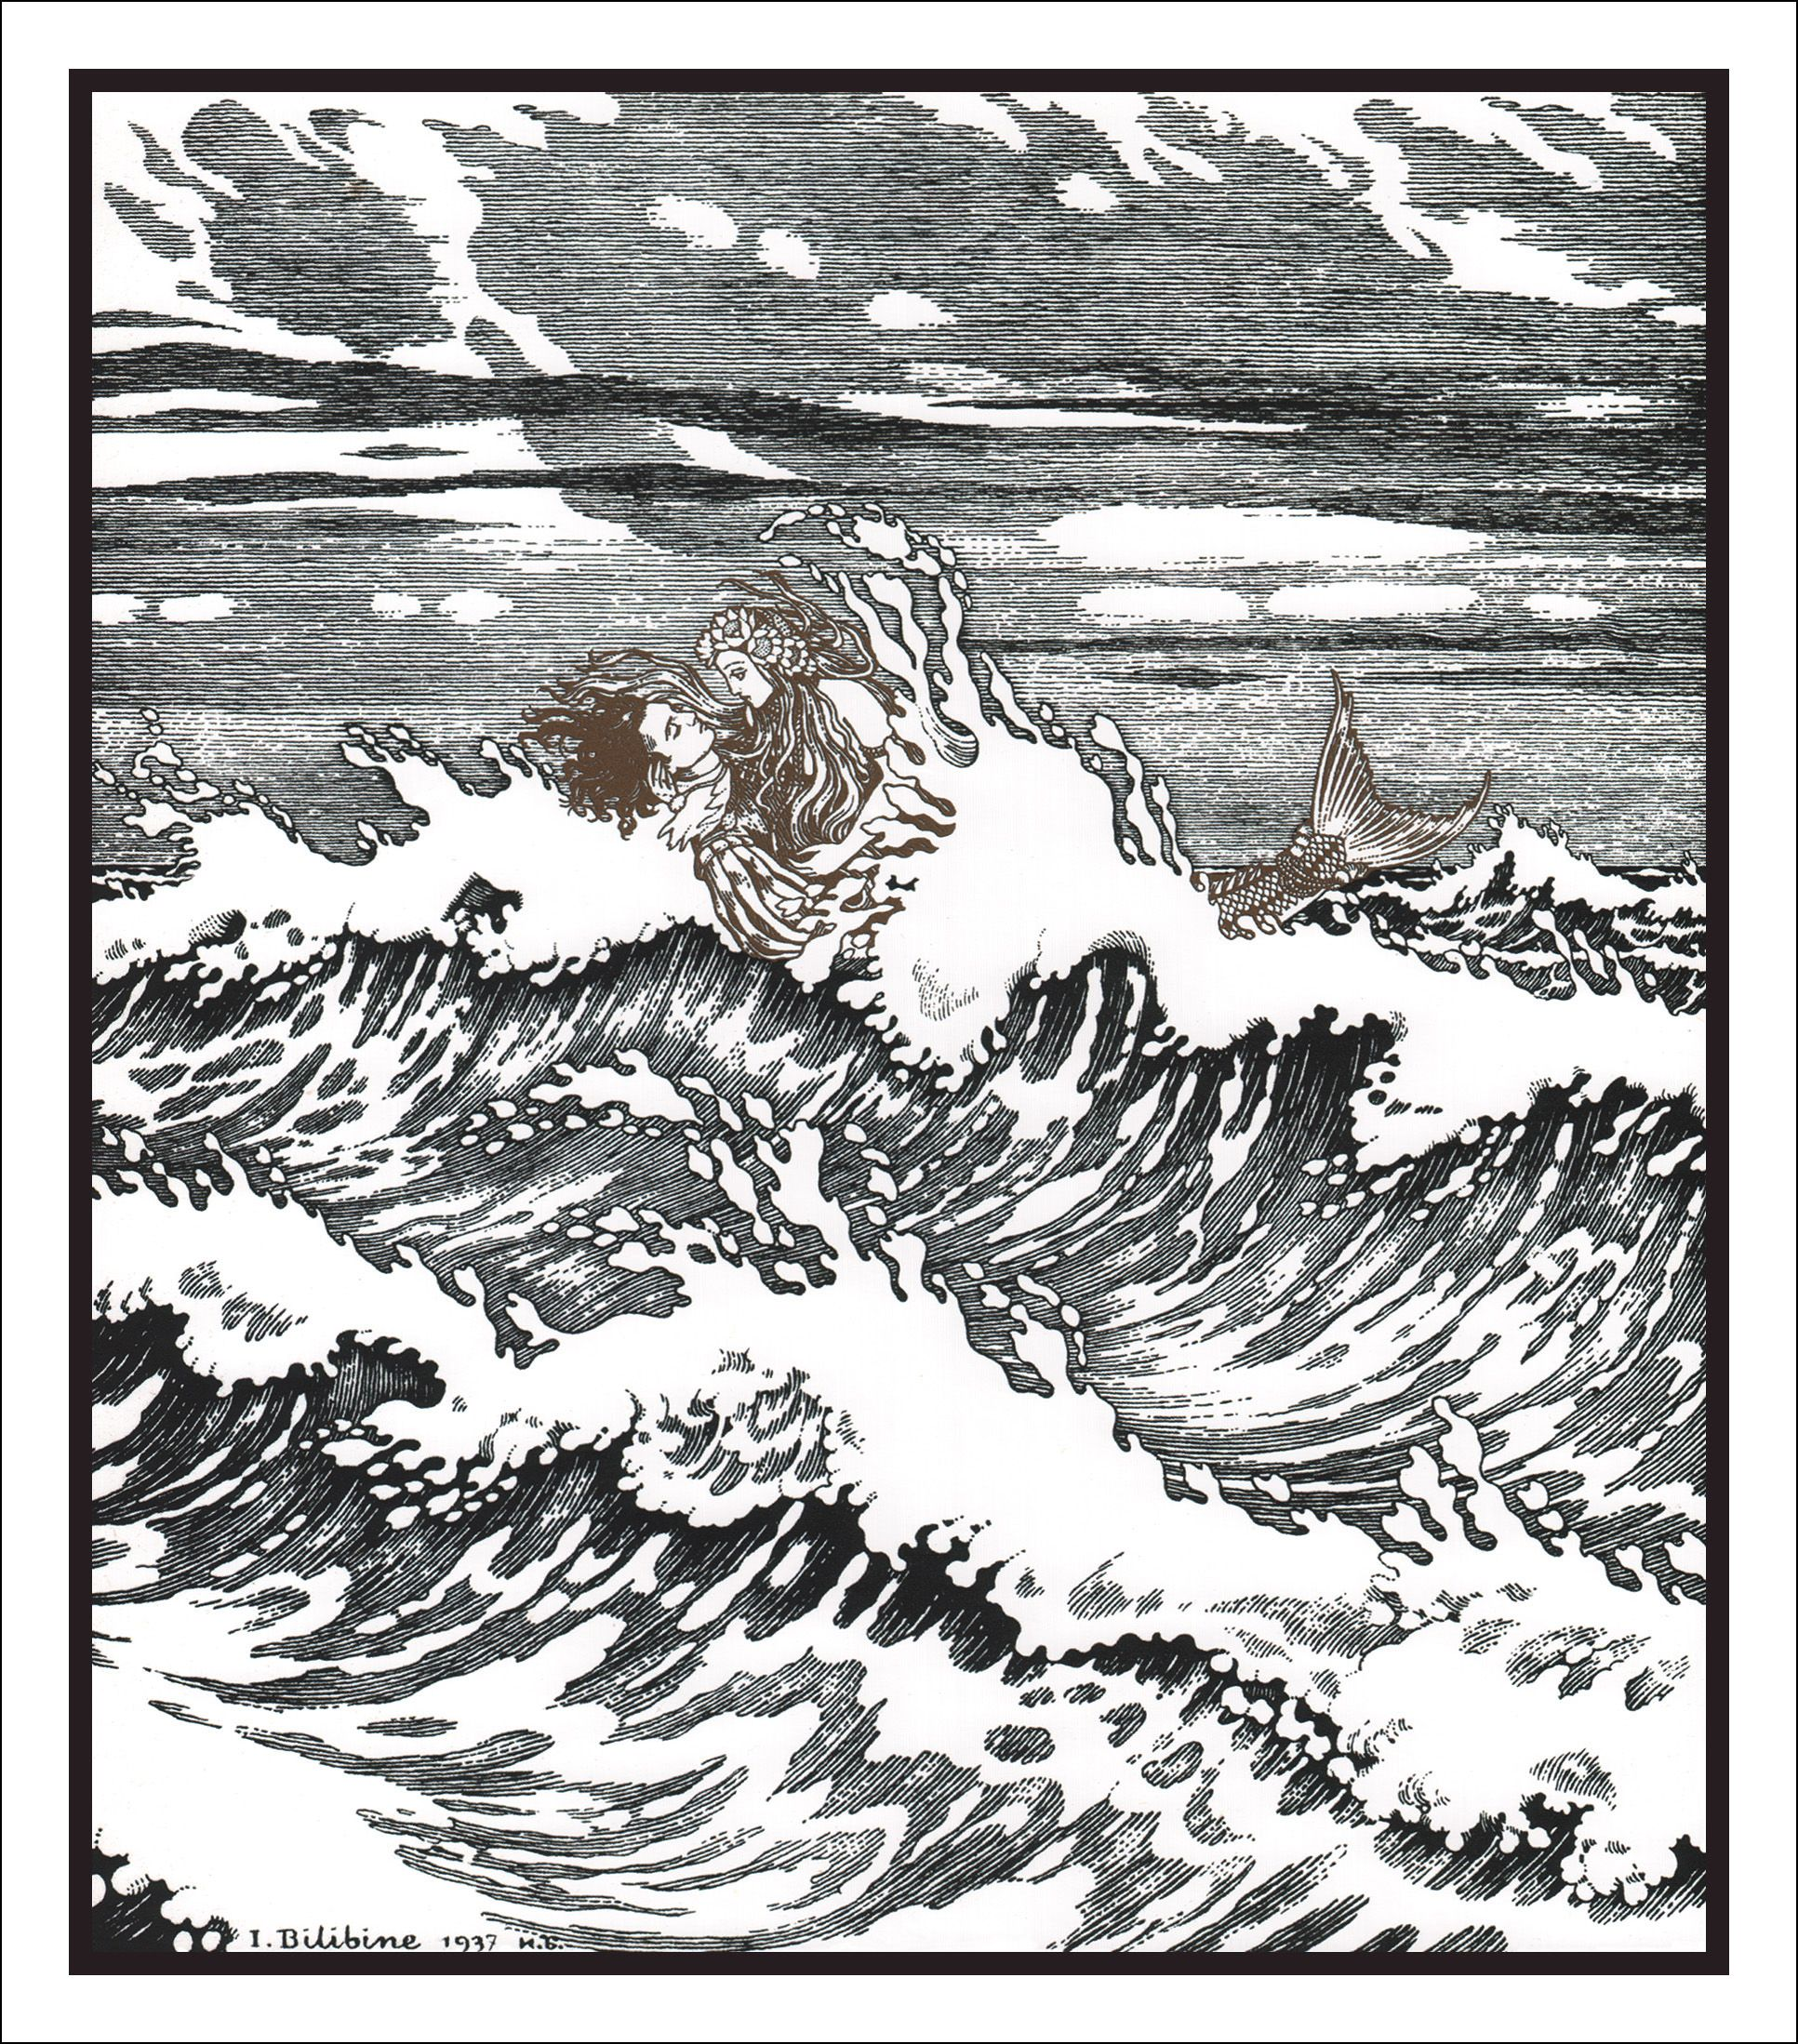 Hans Christian Andersen. The Little Mermaid.  Illustrator Ivan Bilibin.